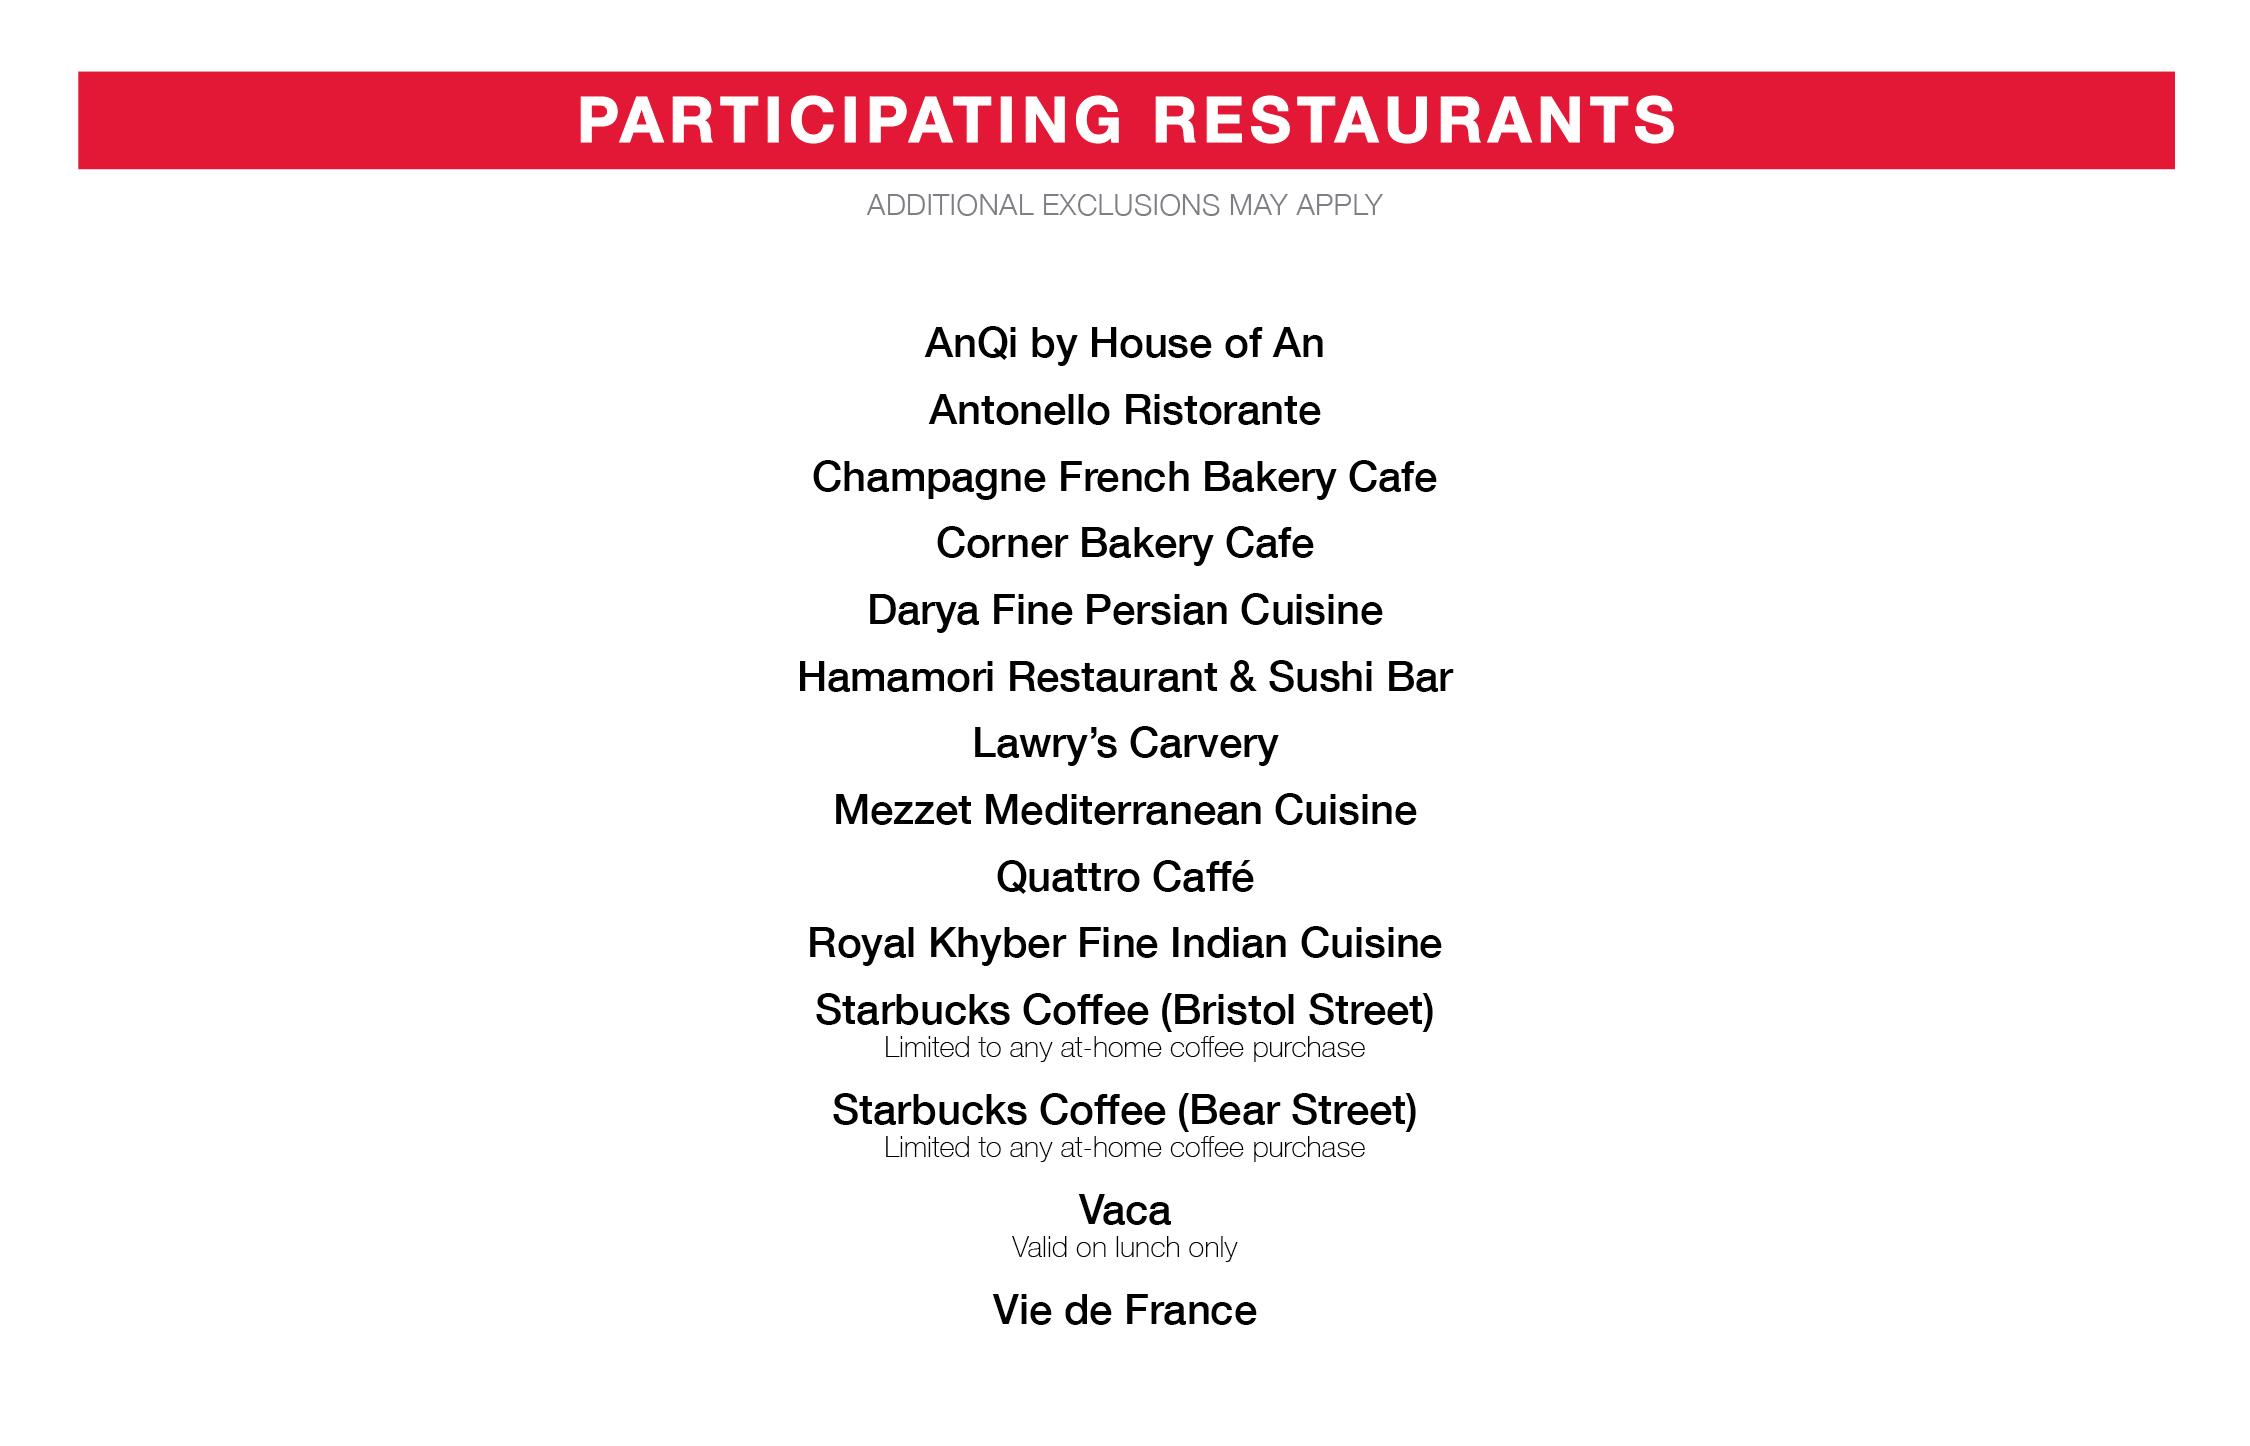 store-listing-digital-8-1-18-restaurants.png